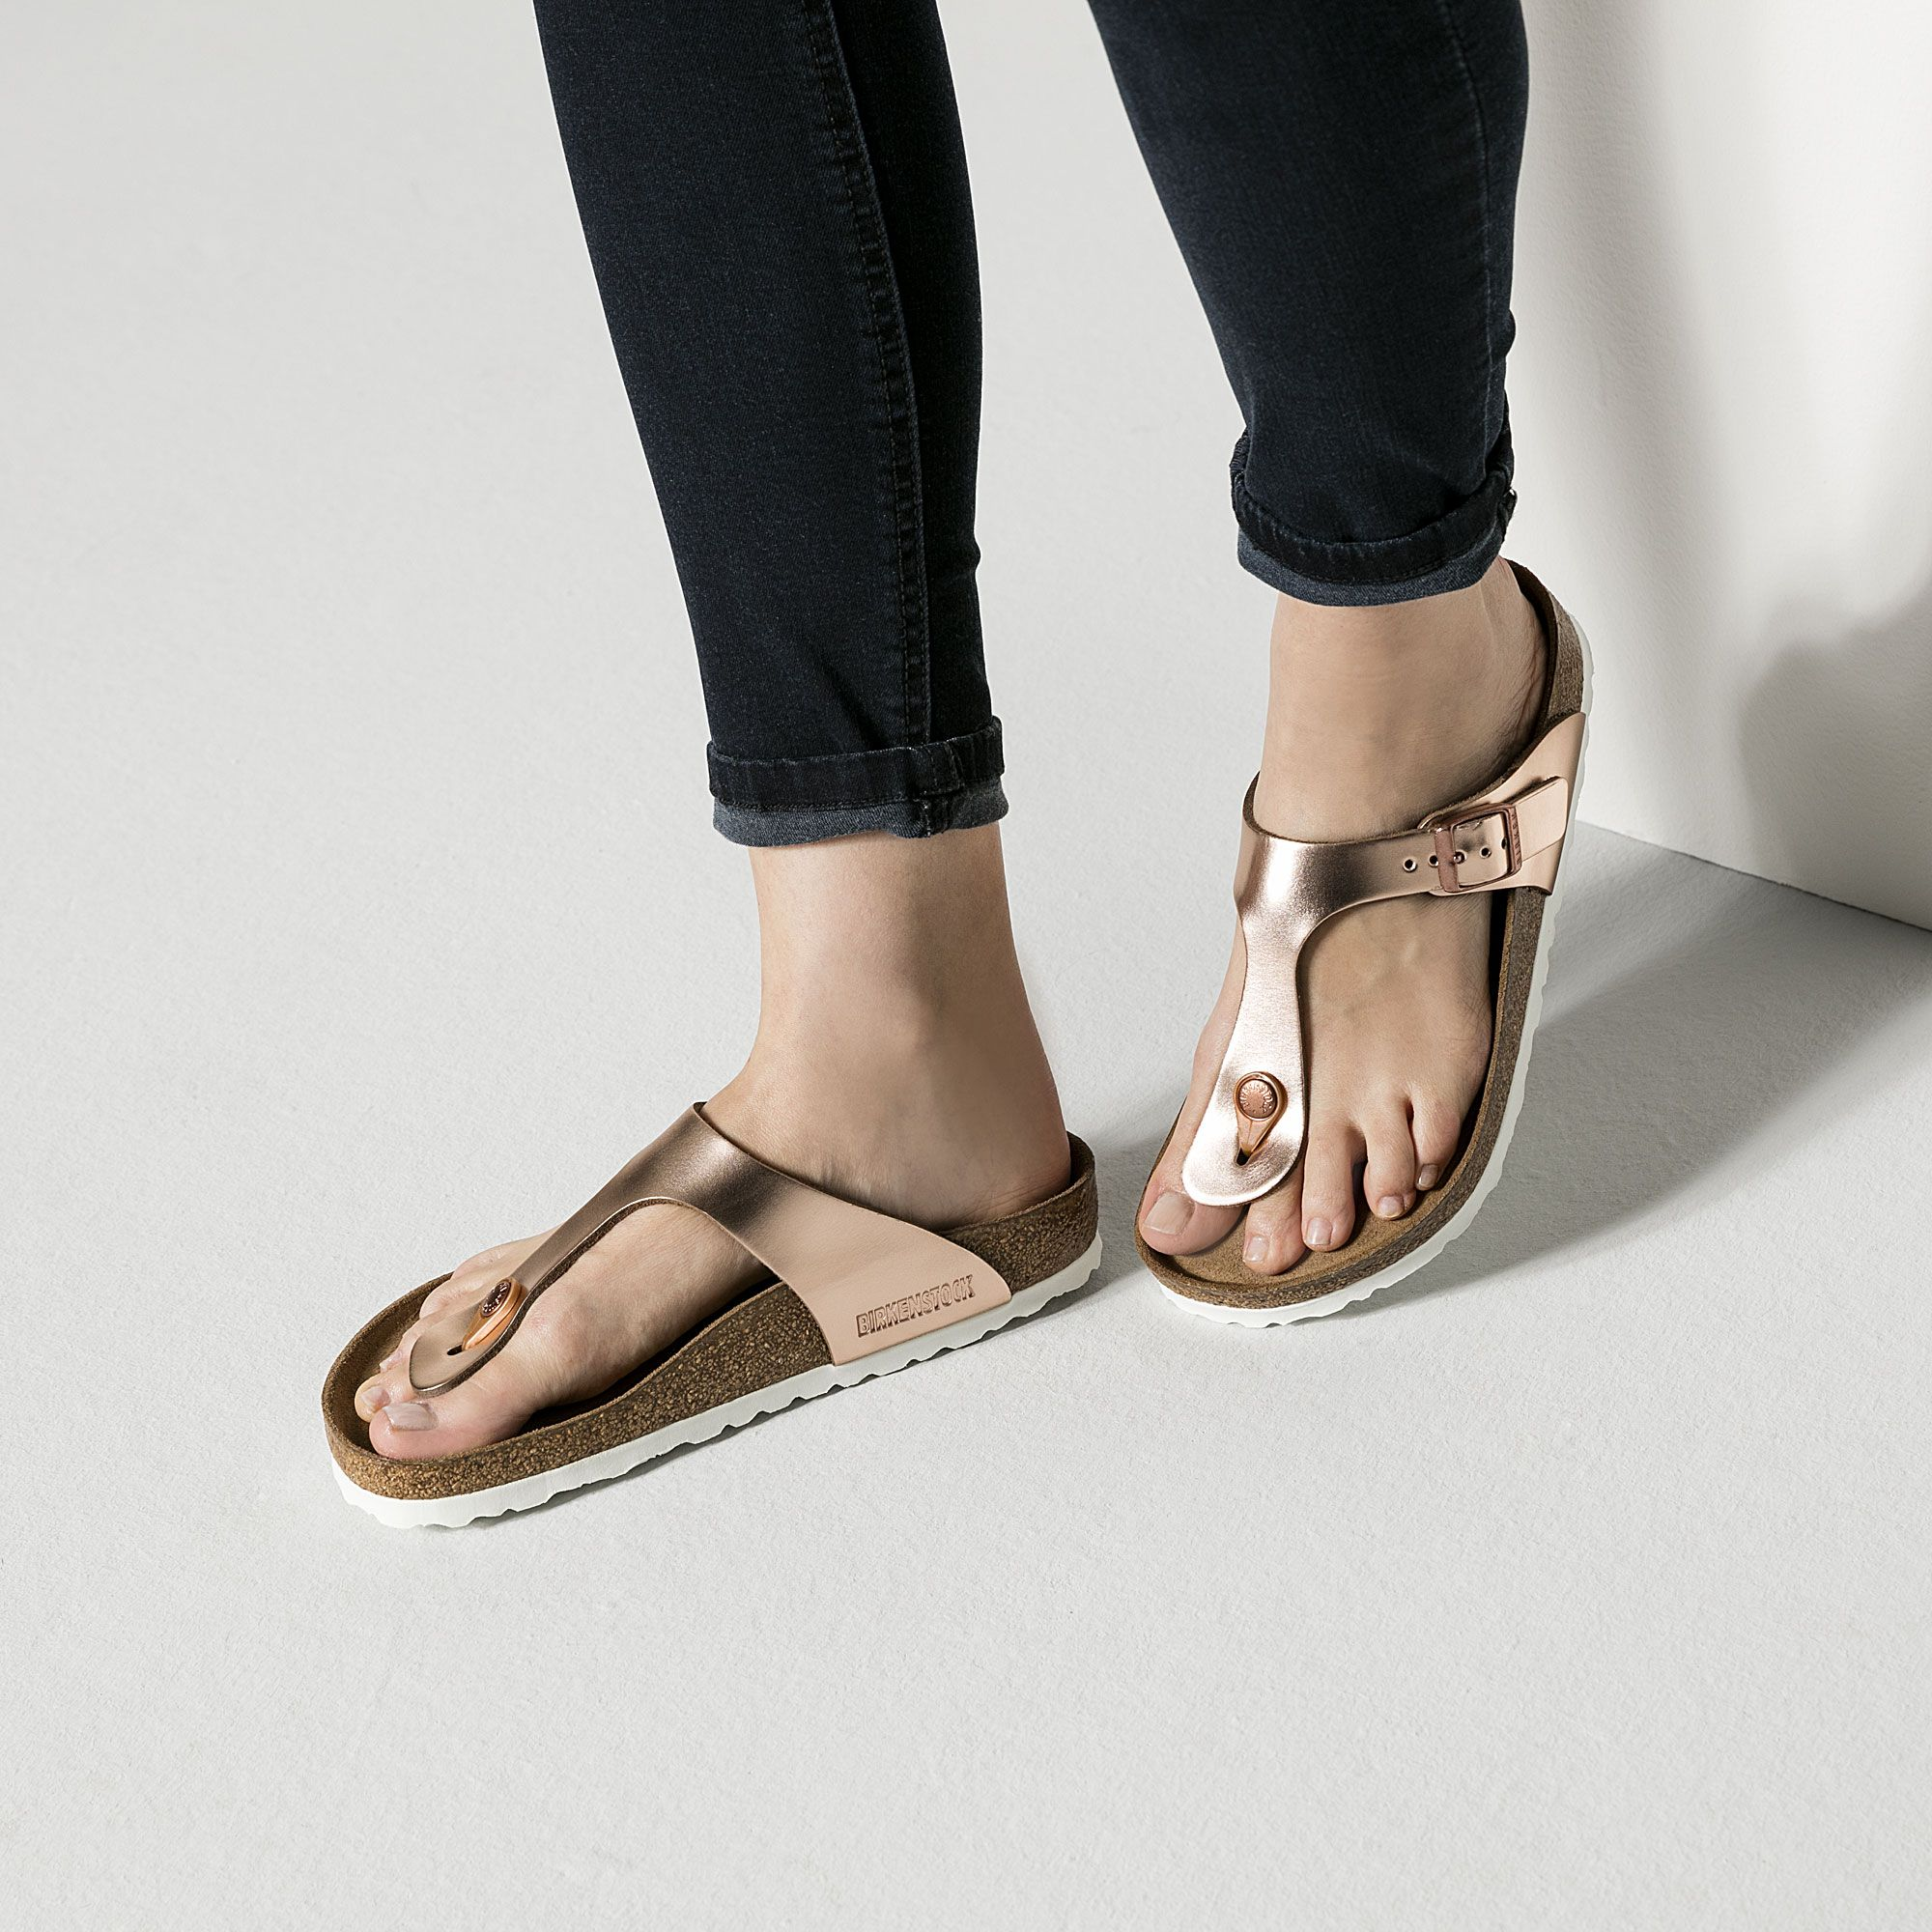 Gizeh Natural Leather Soft Footbed Metallic Copper Shoe Inspiration Black Wedge Shoes Birkenstock